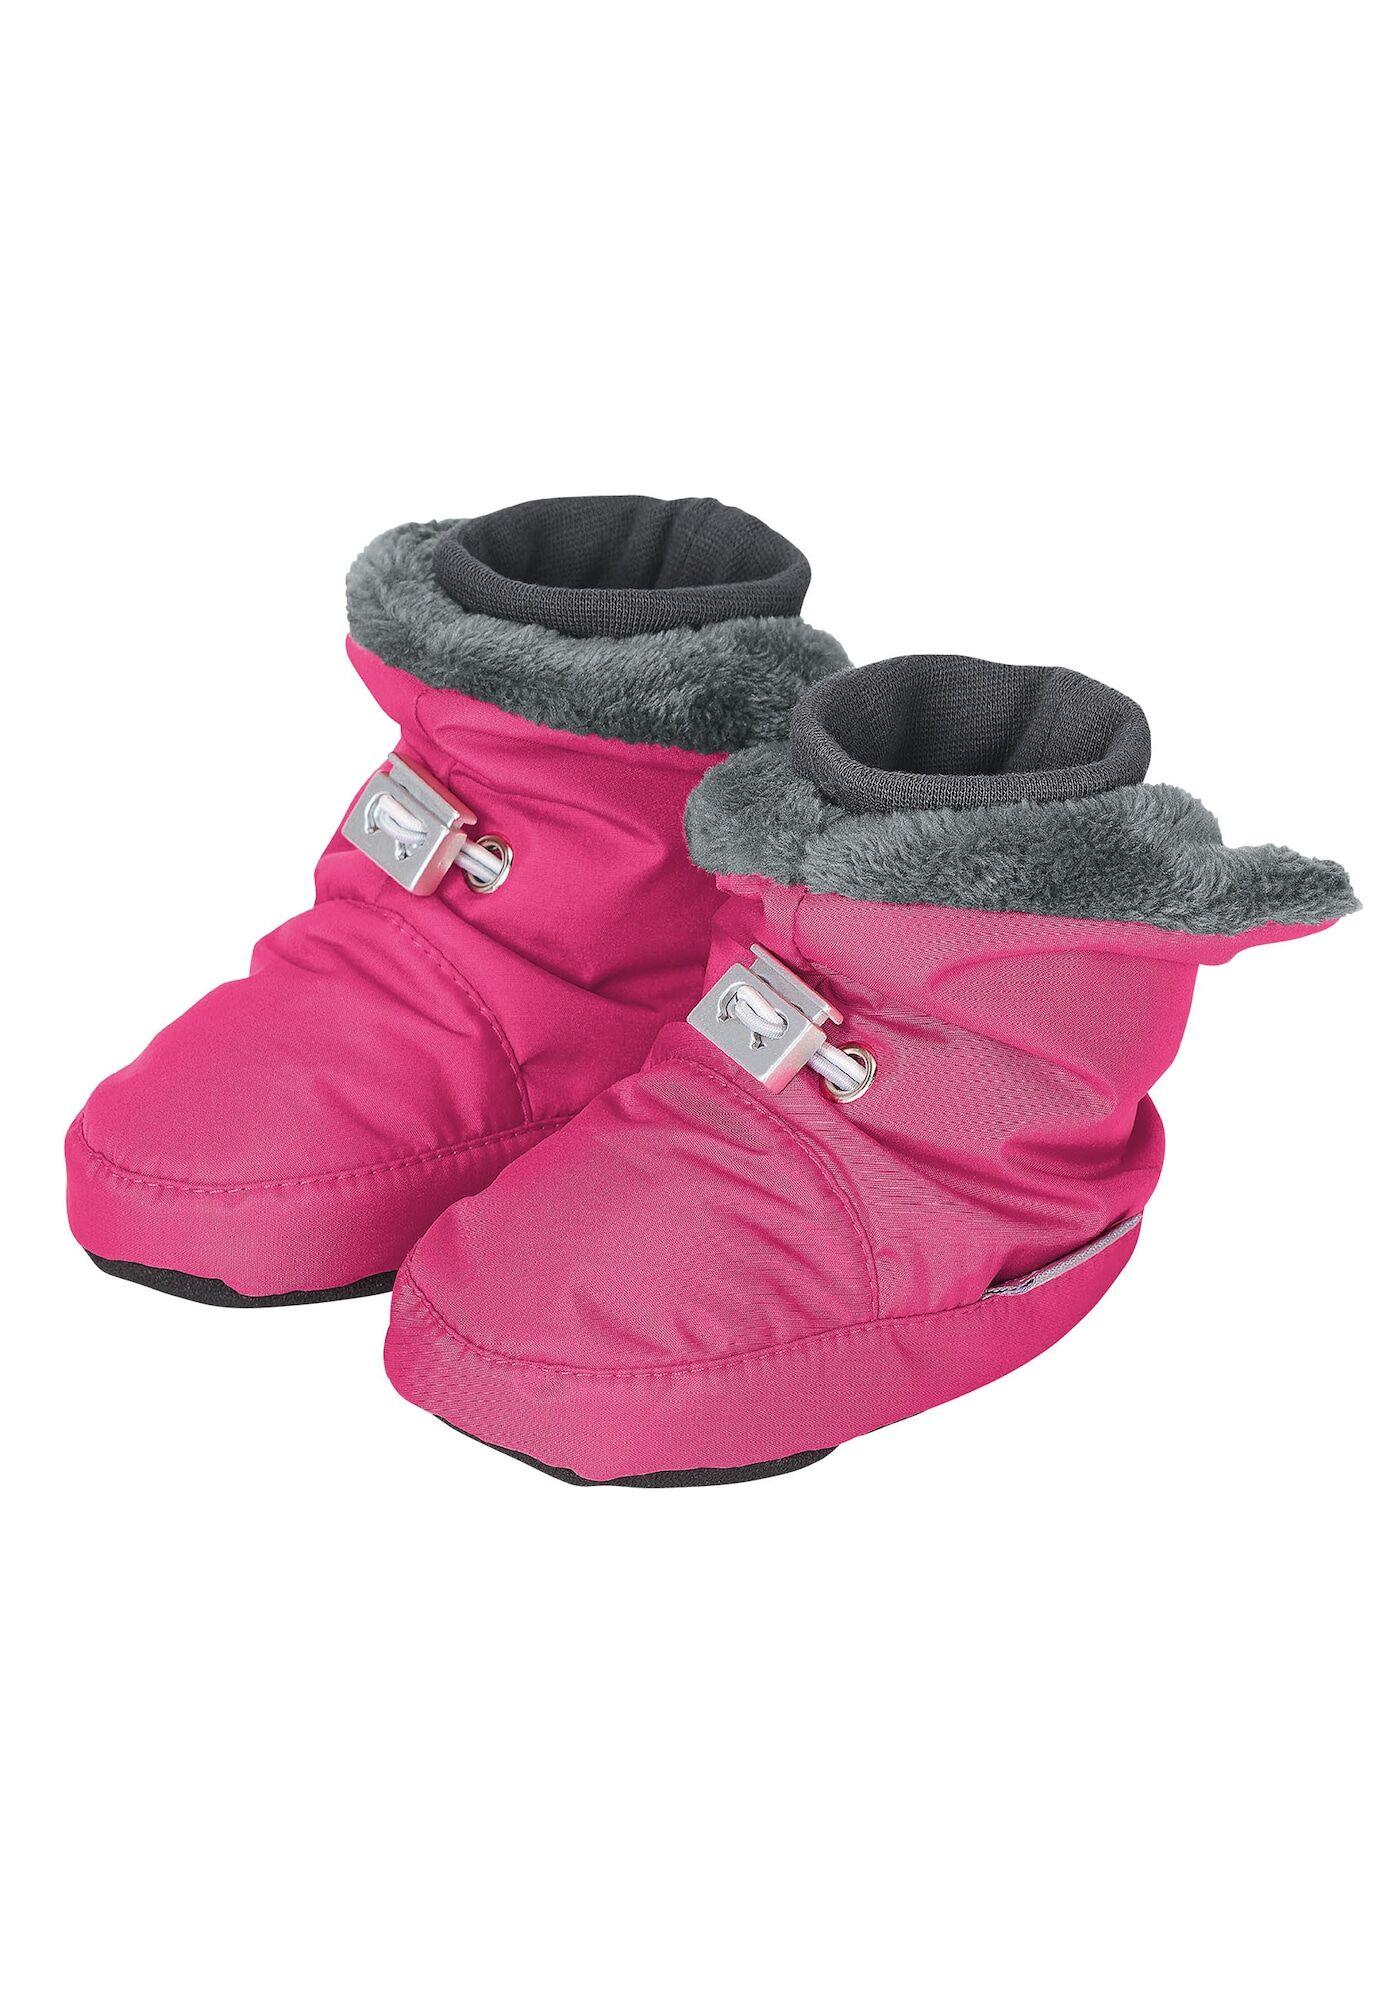 STERNTALER Bottes de neige  - Rose - Taille: 18 - kids